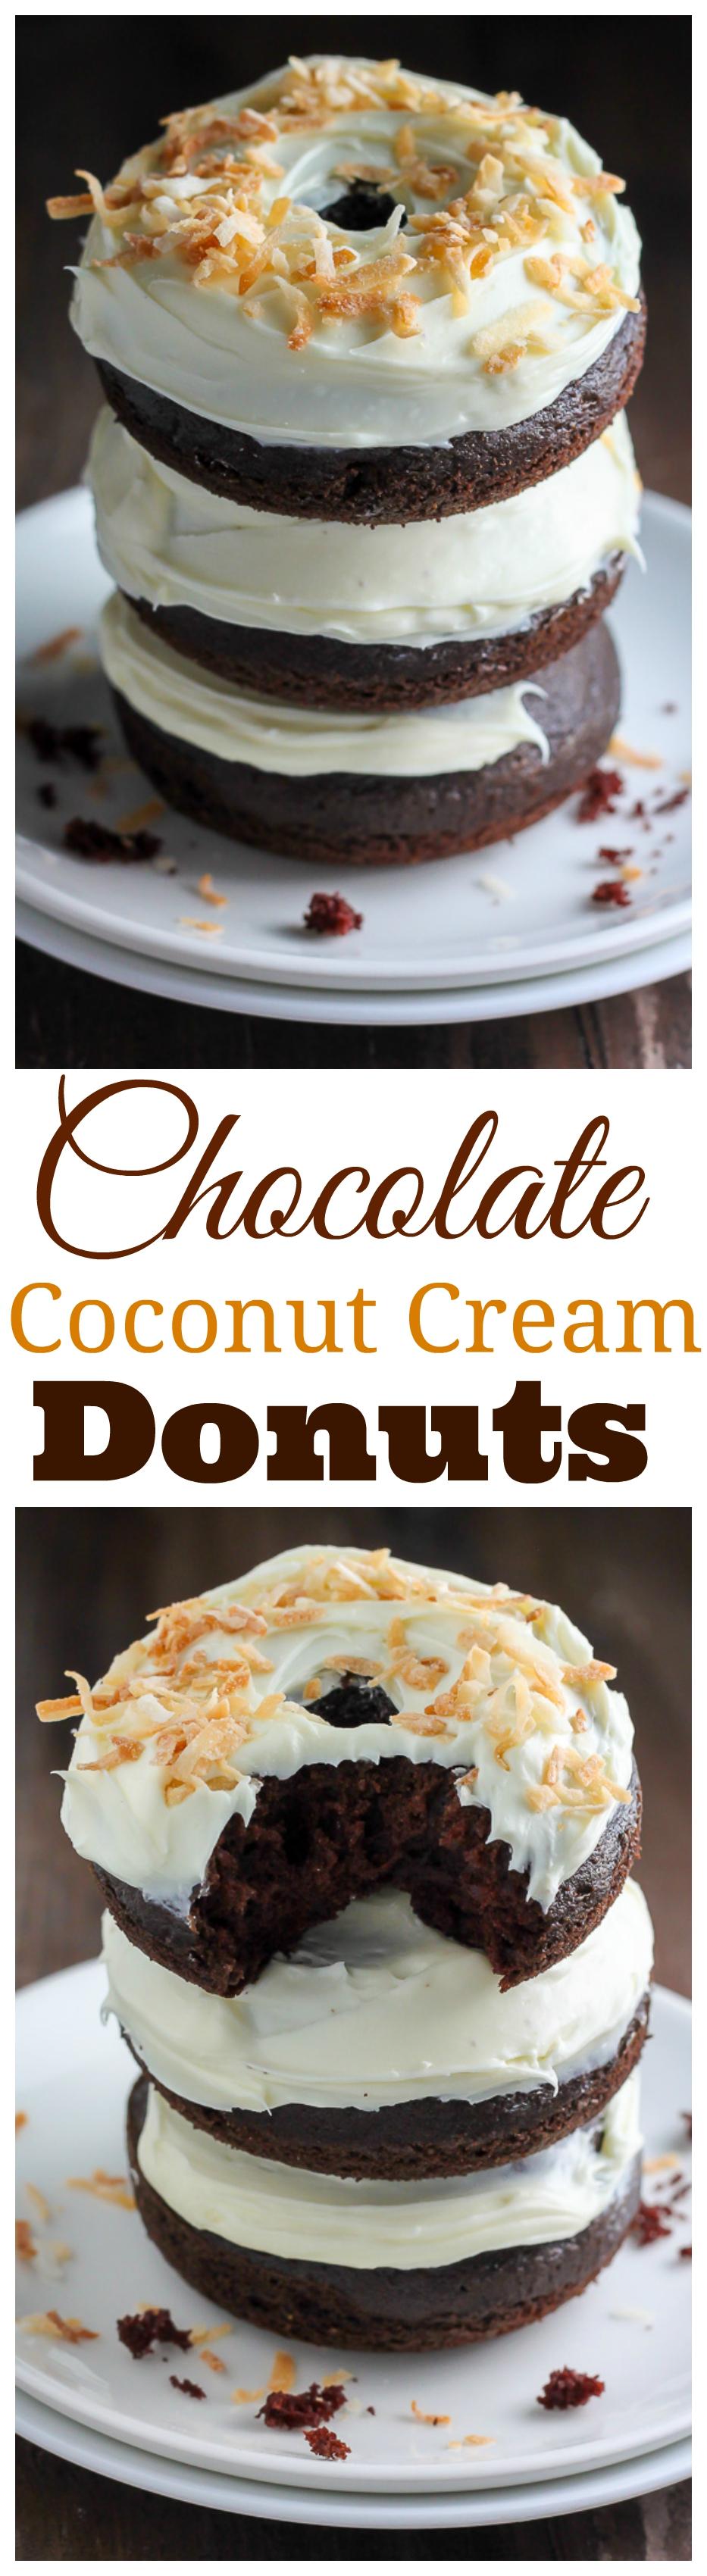 Chocolate Coconut Cream Donuts